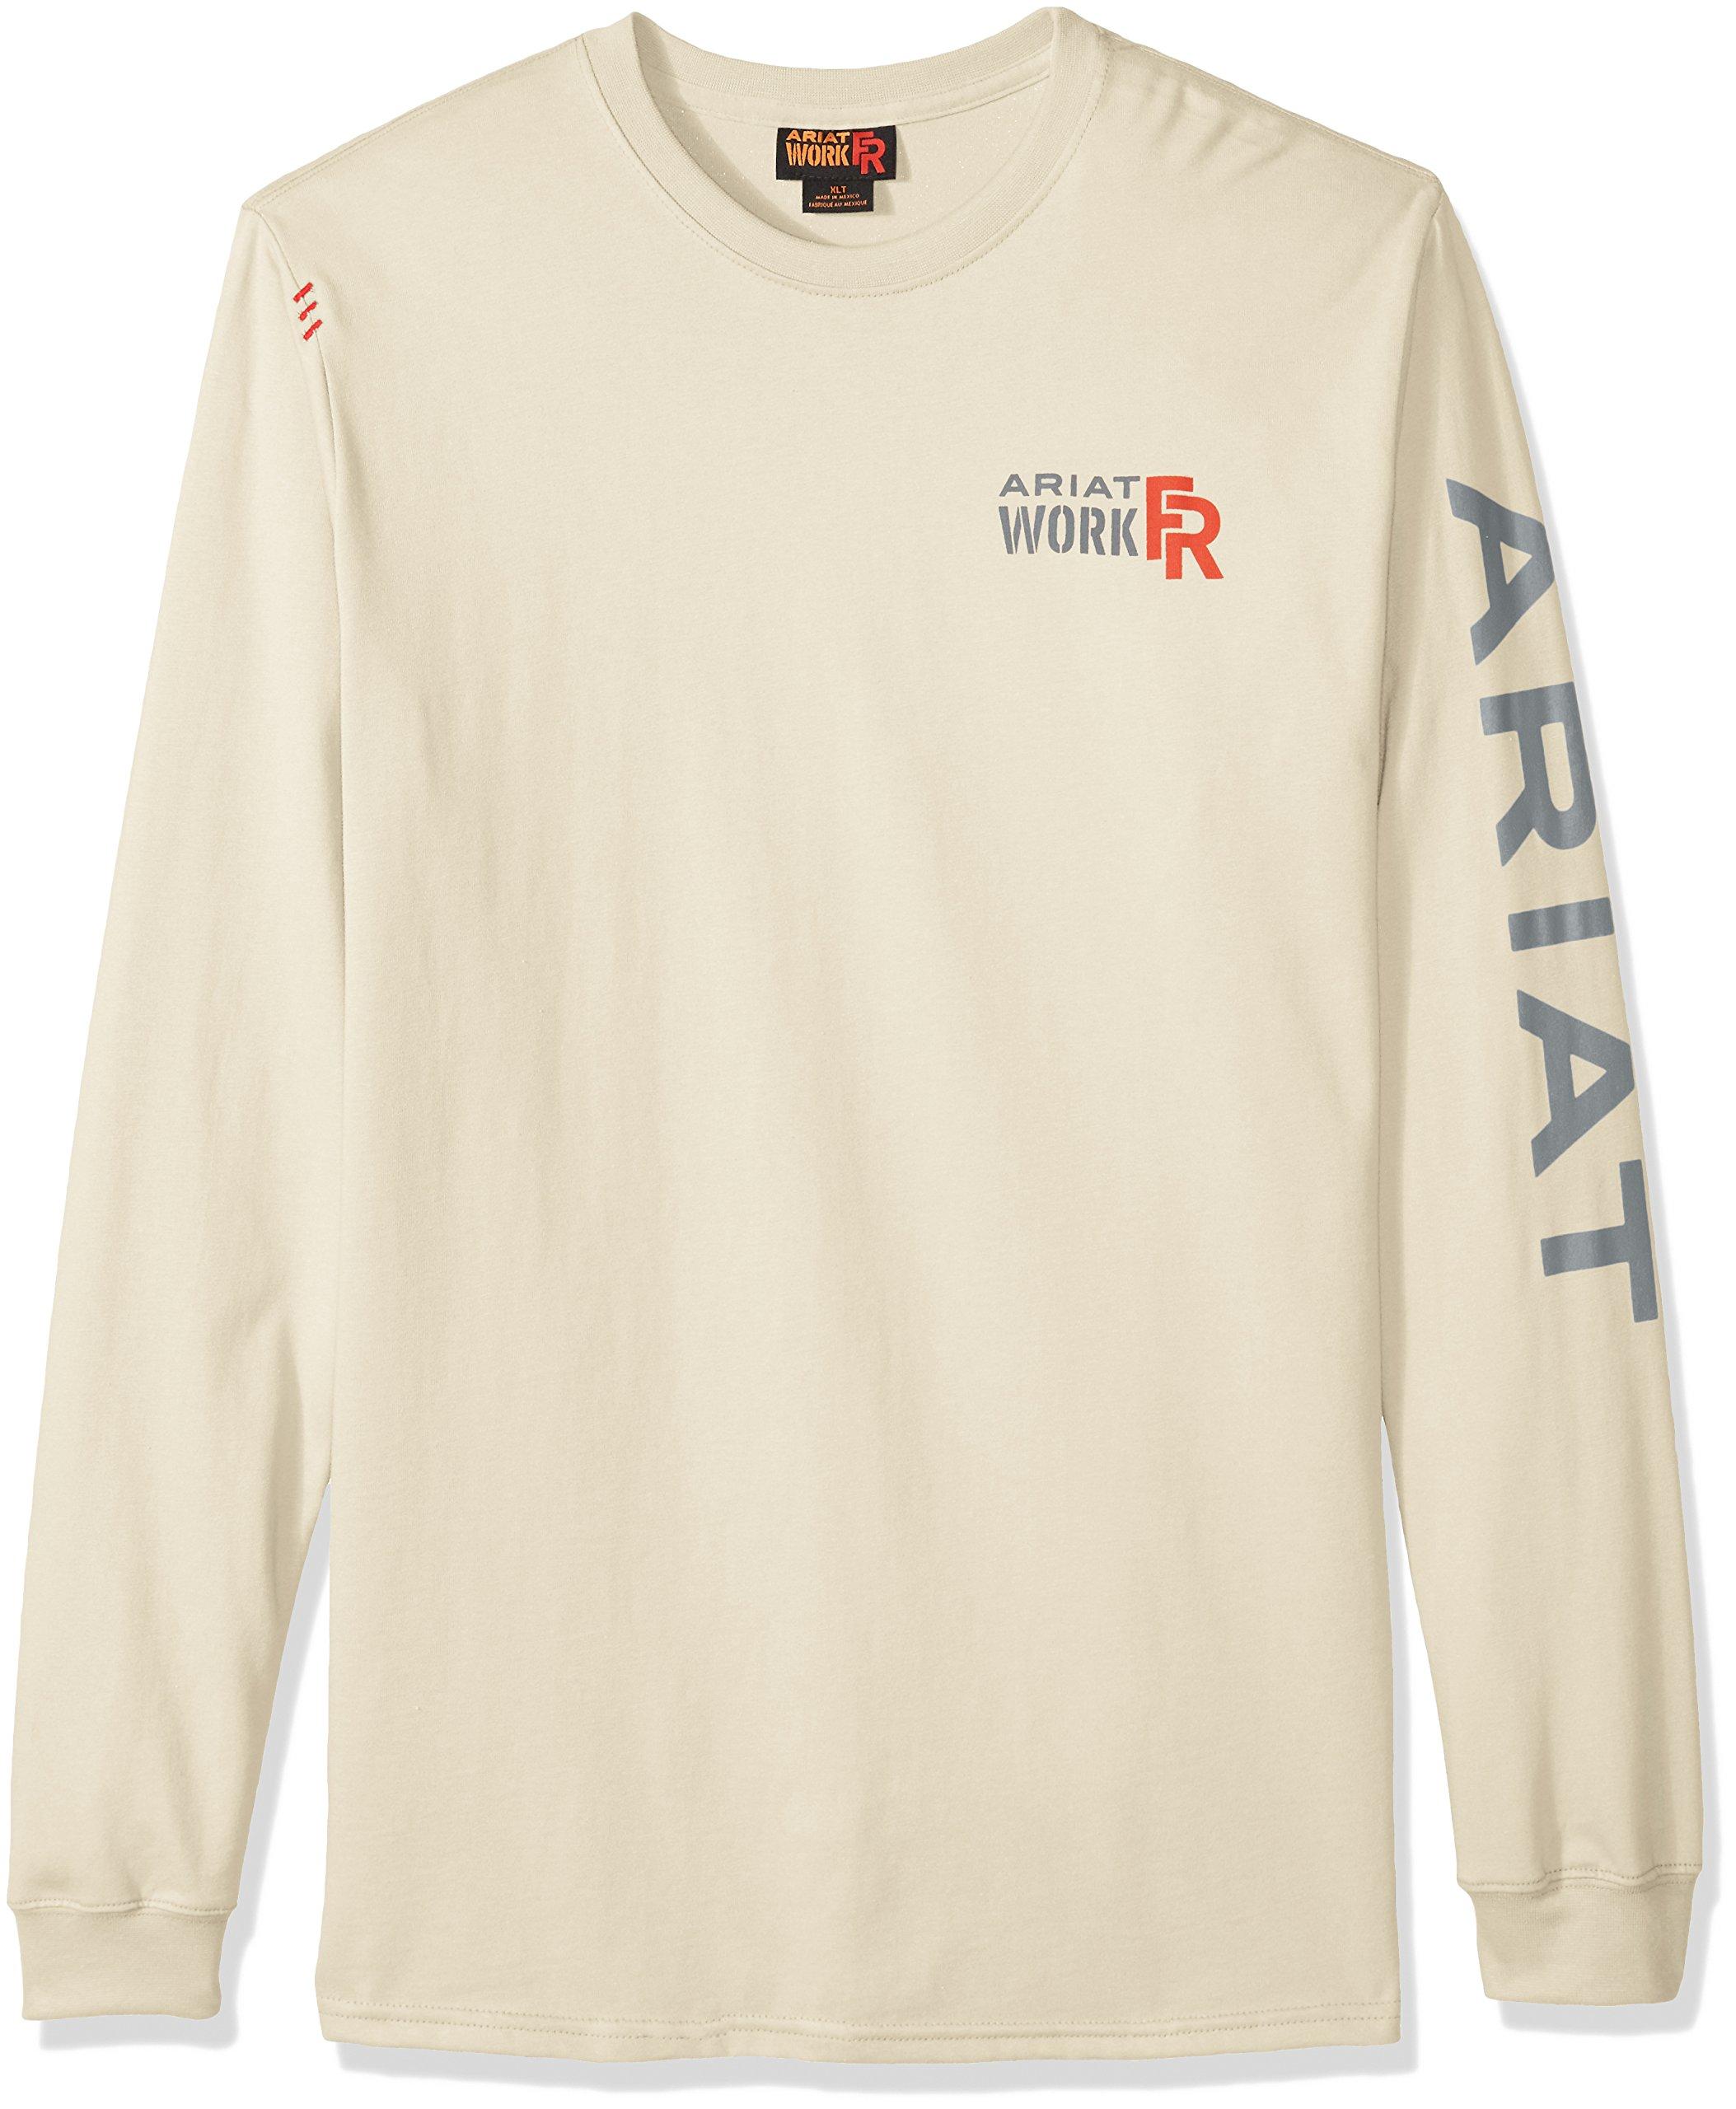 ARIAT Men's Fr Crew Logo T-Shirt Sand Size XL-T